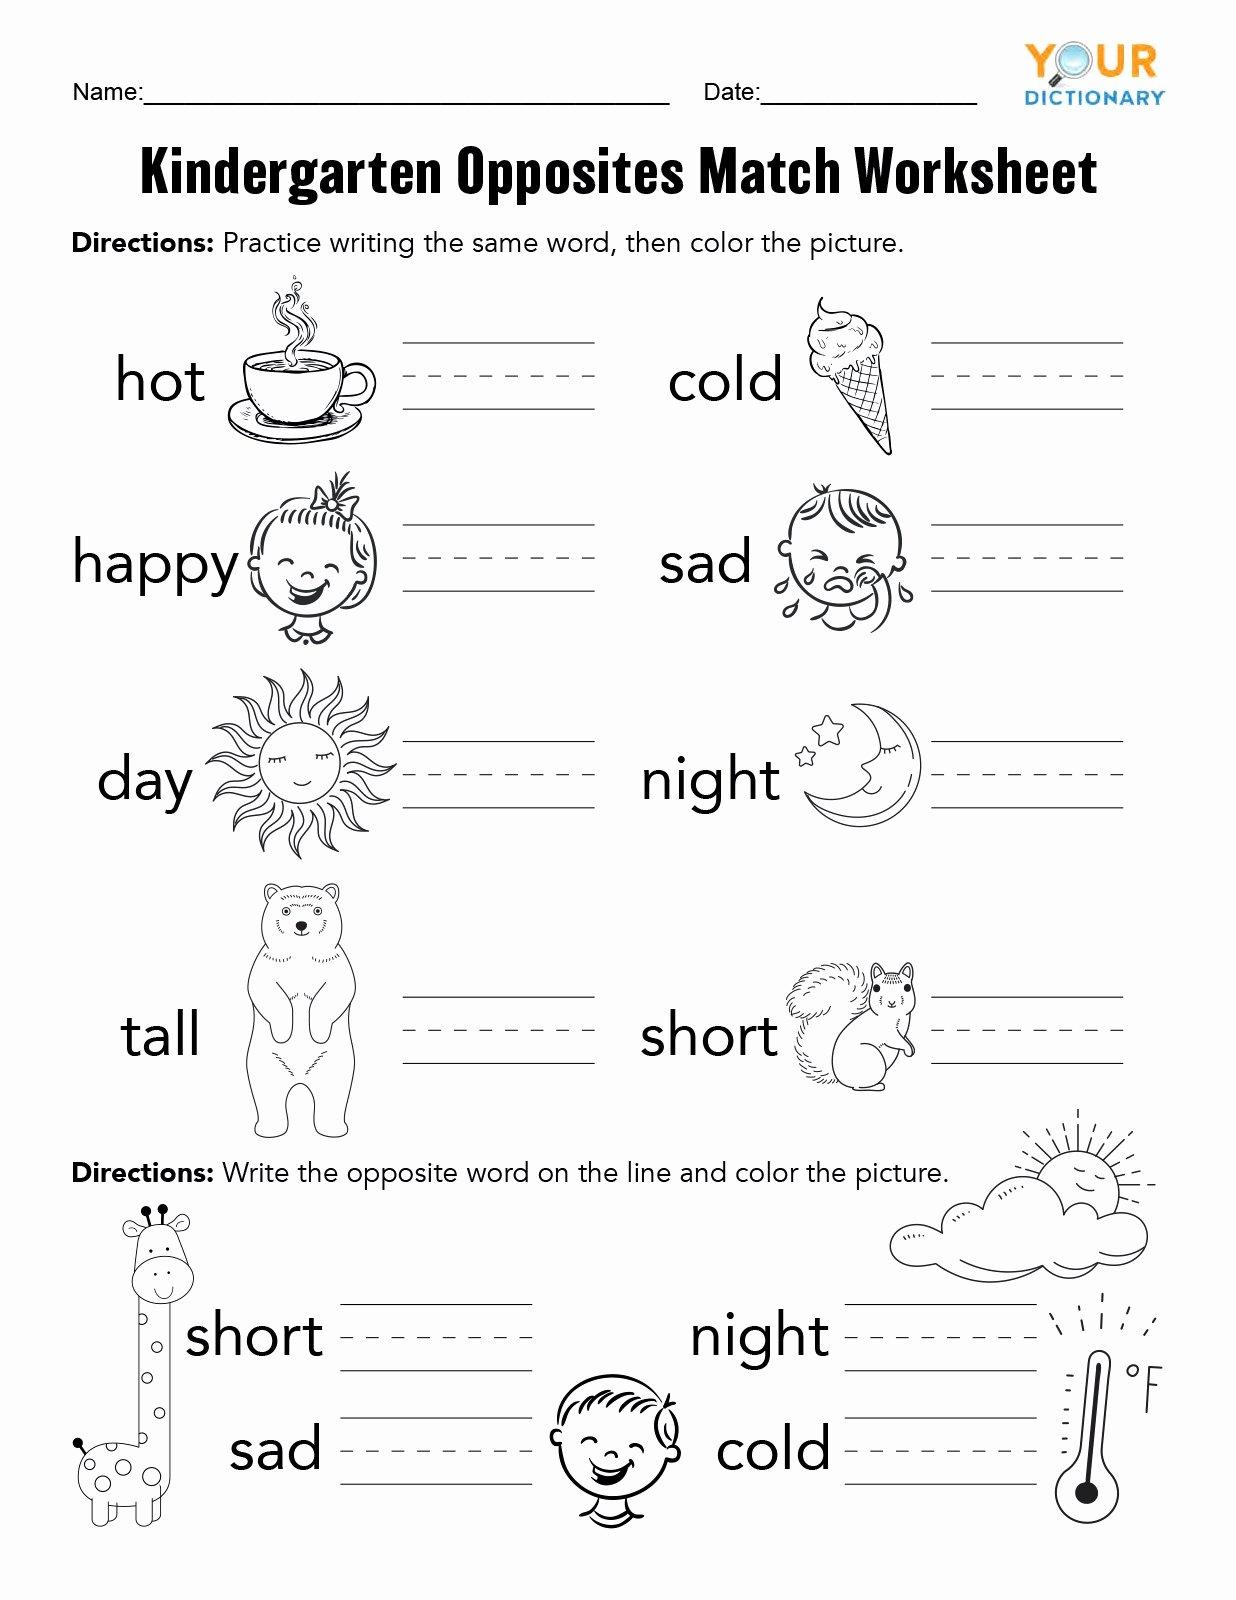 Worksheets for Preschoolers Opposites Kids Kindergarten Opposites Worksheet Remarkable Learning Sheets